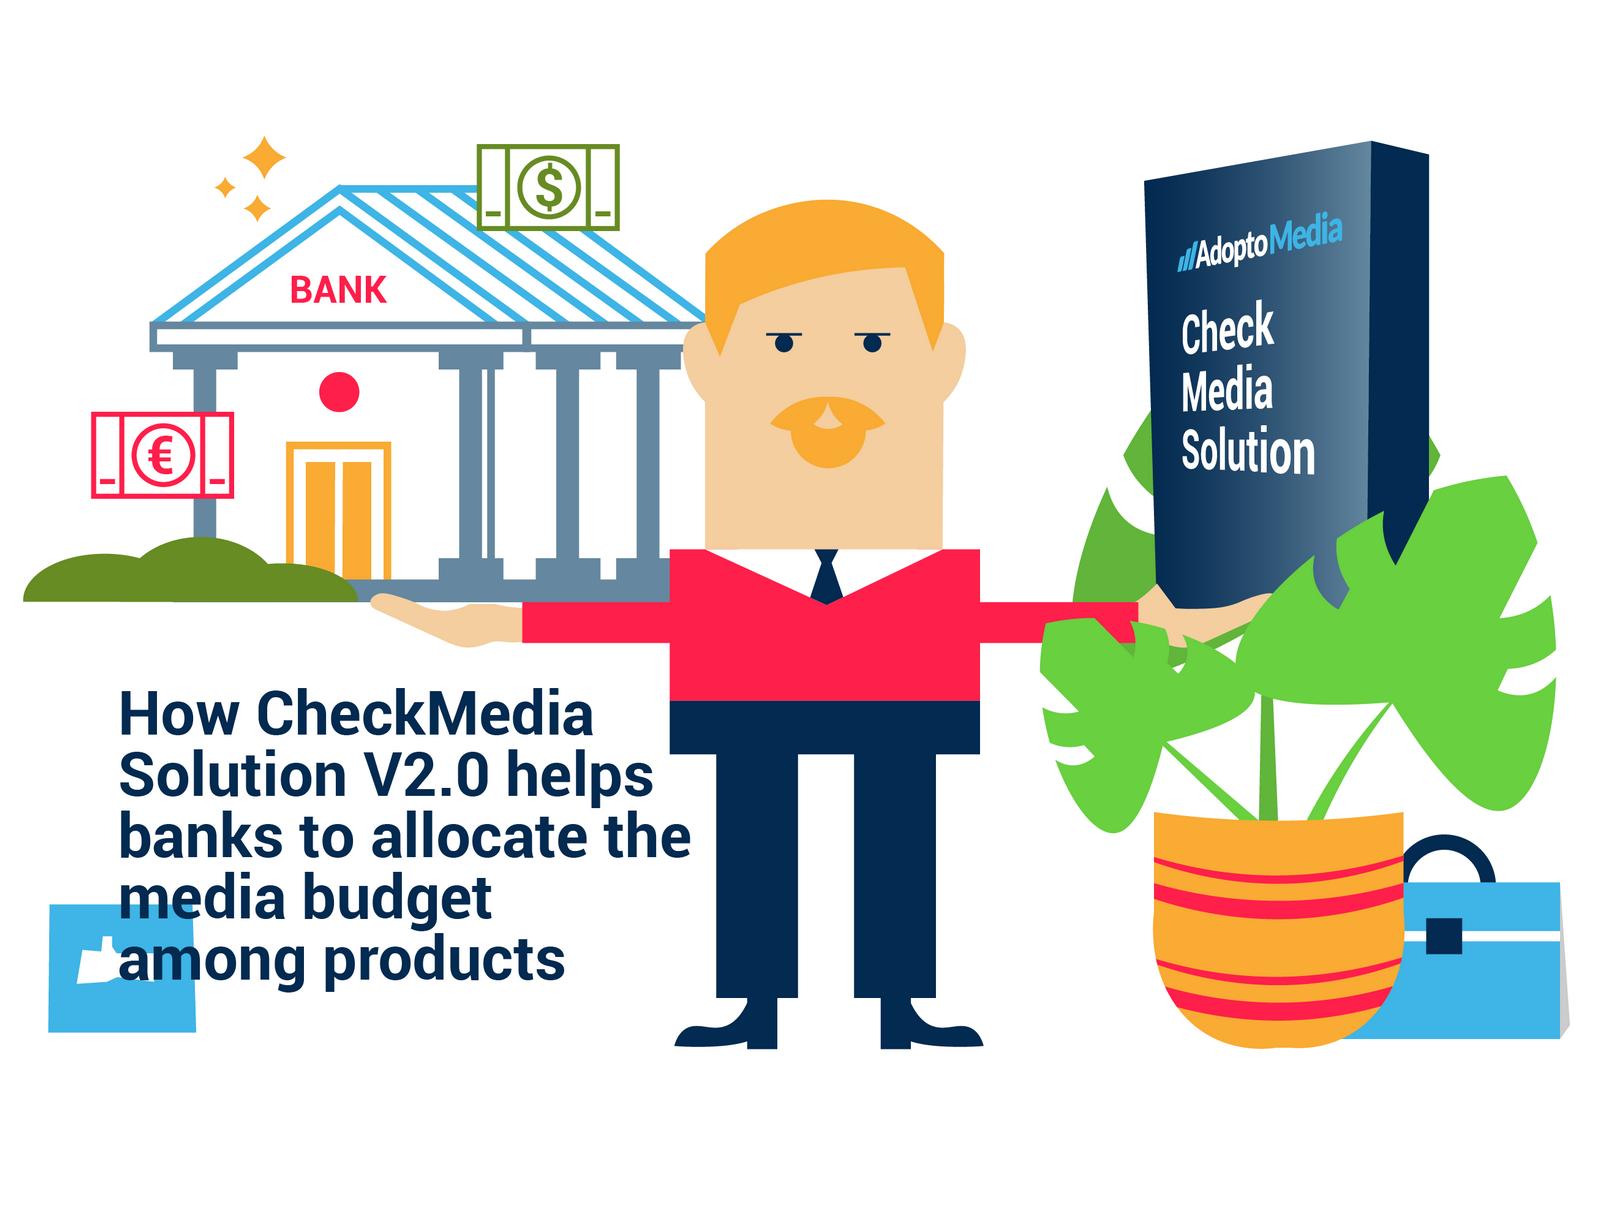 AdoptoMedia, CheckMedia Solution, Bank's Media Mix, Marketing Resource Management, allocating the media budget